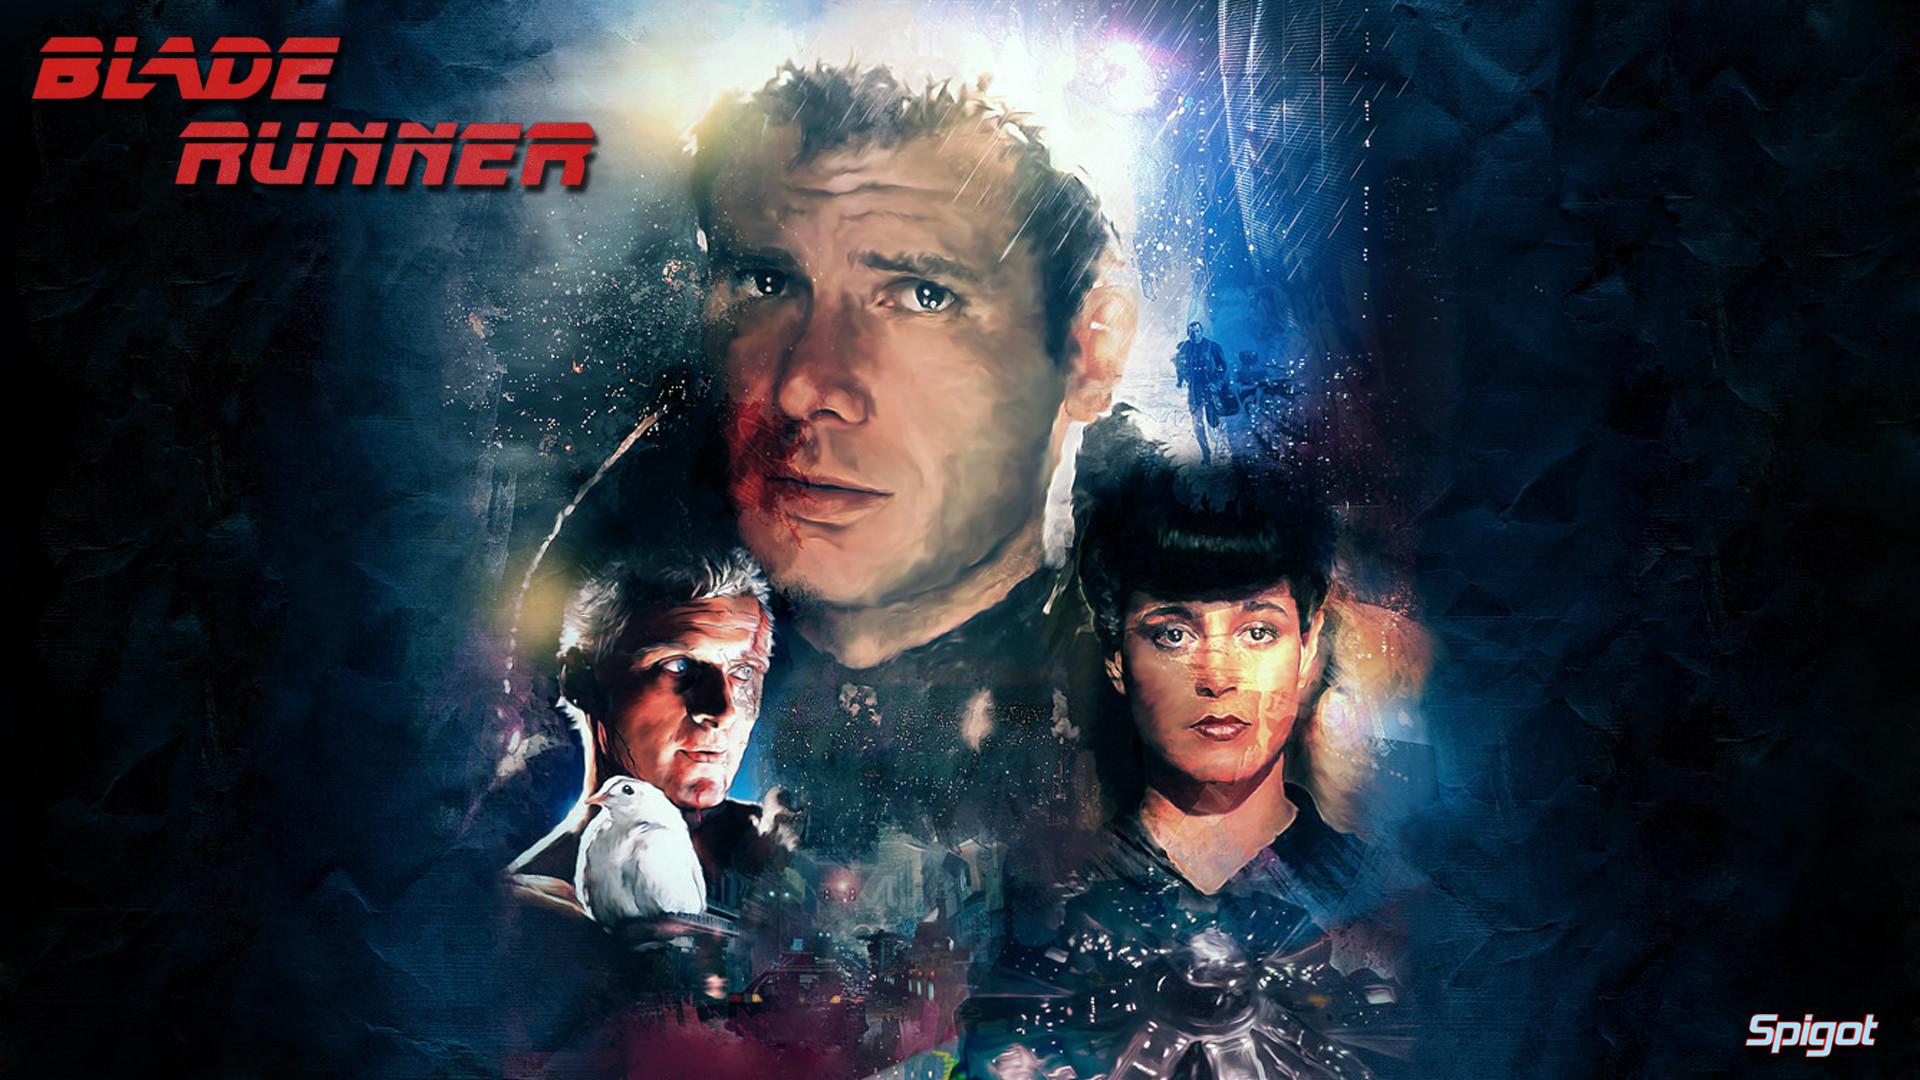 Res: 1920x1080, Blade Runner